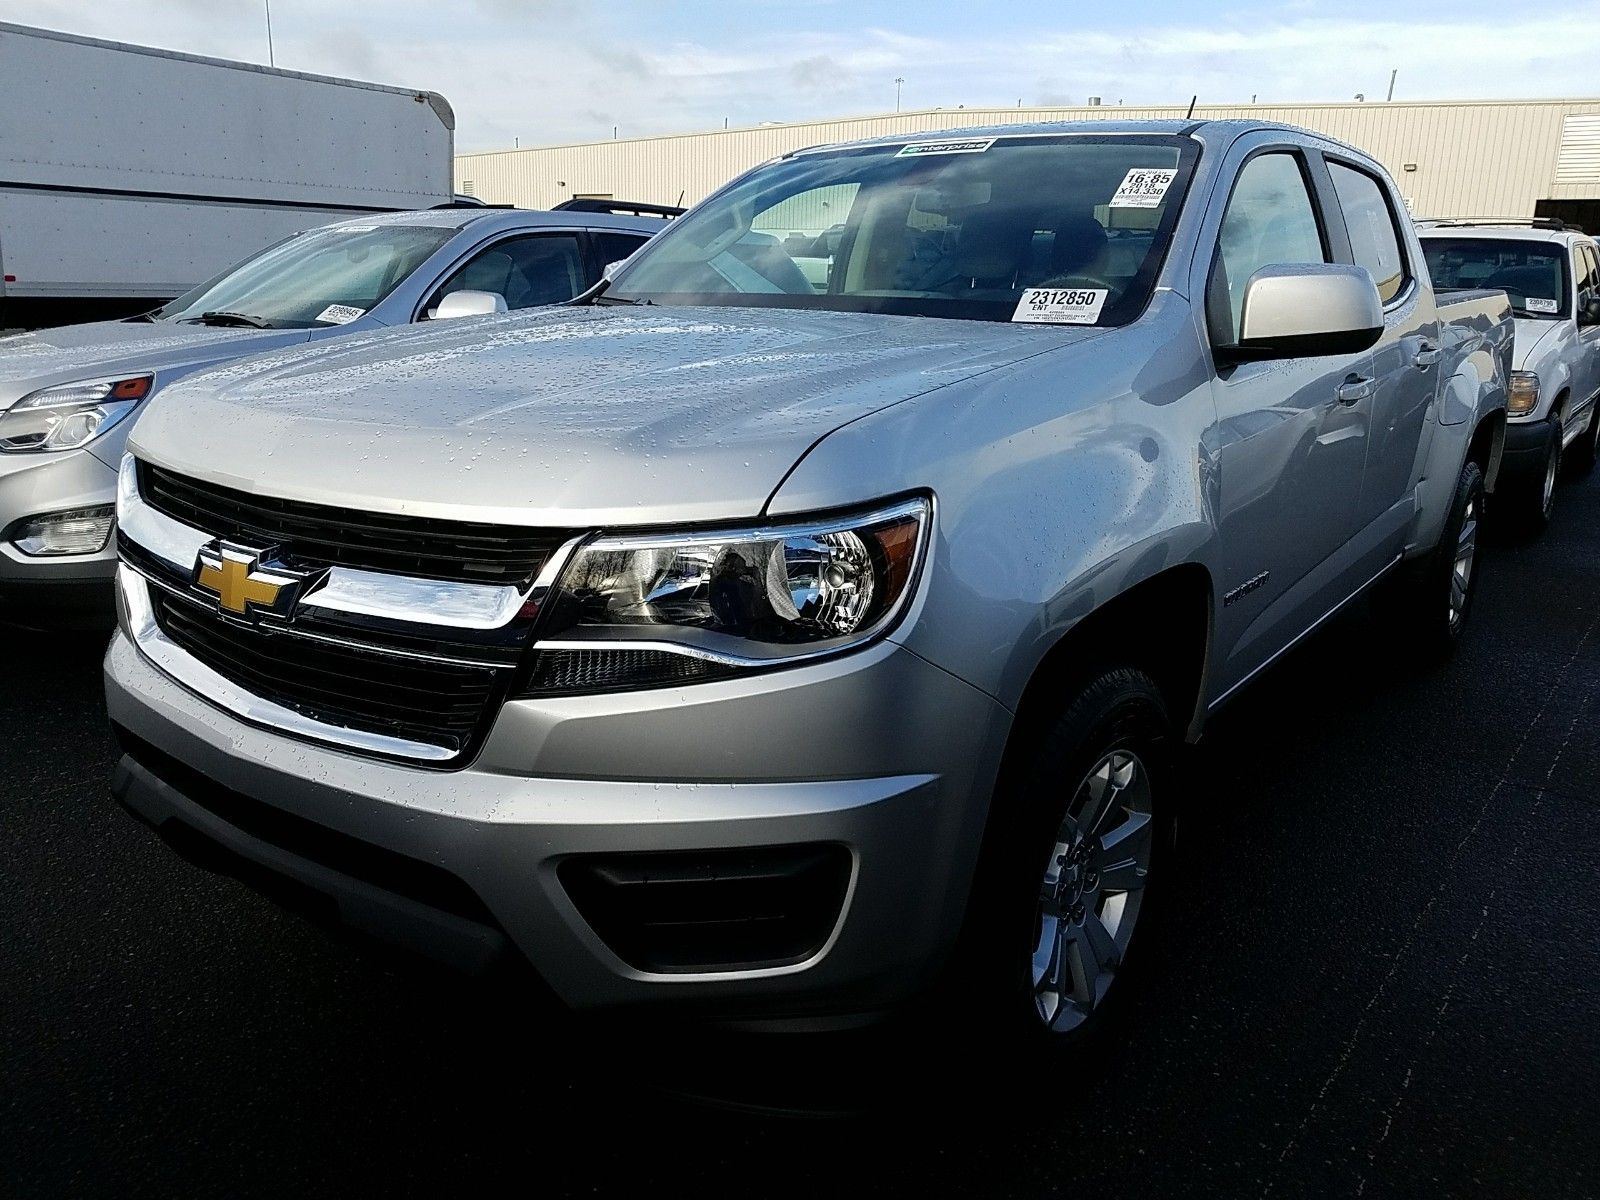 2018 CHEVROLET COLORADO Crew Cab - Used Car Auction - Car